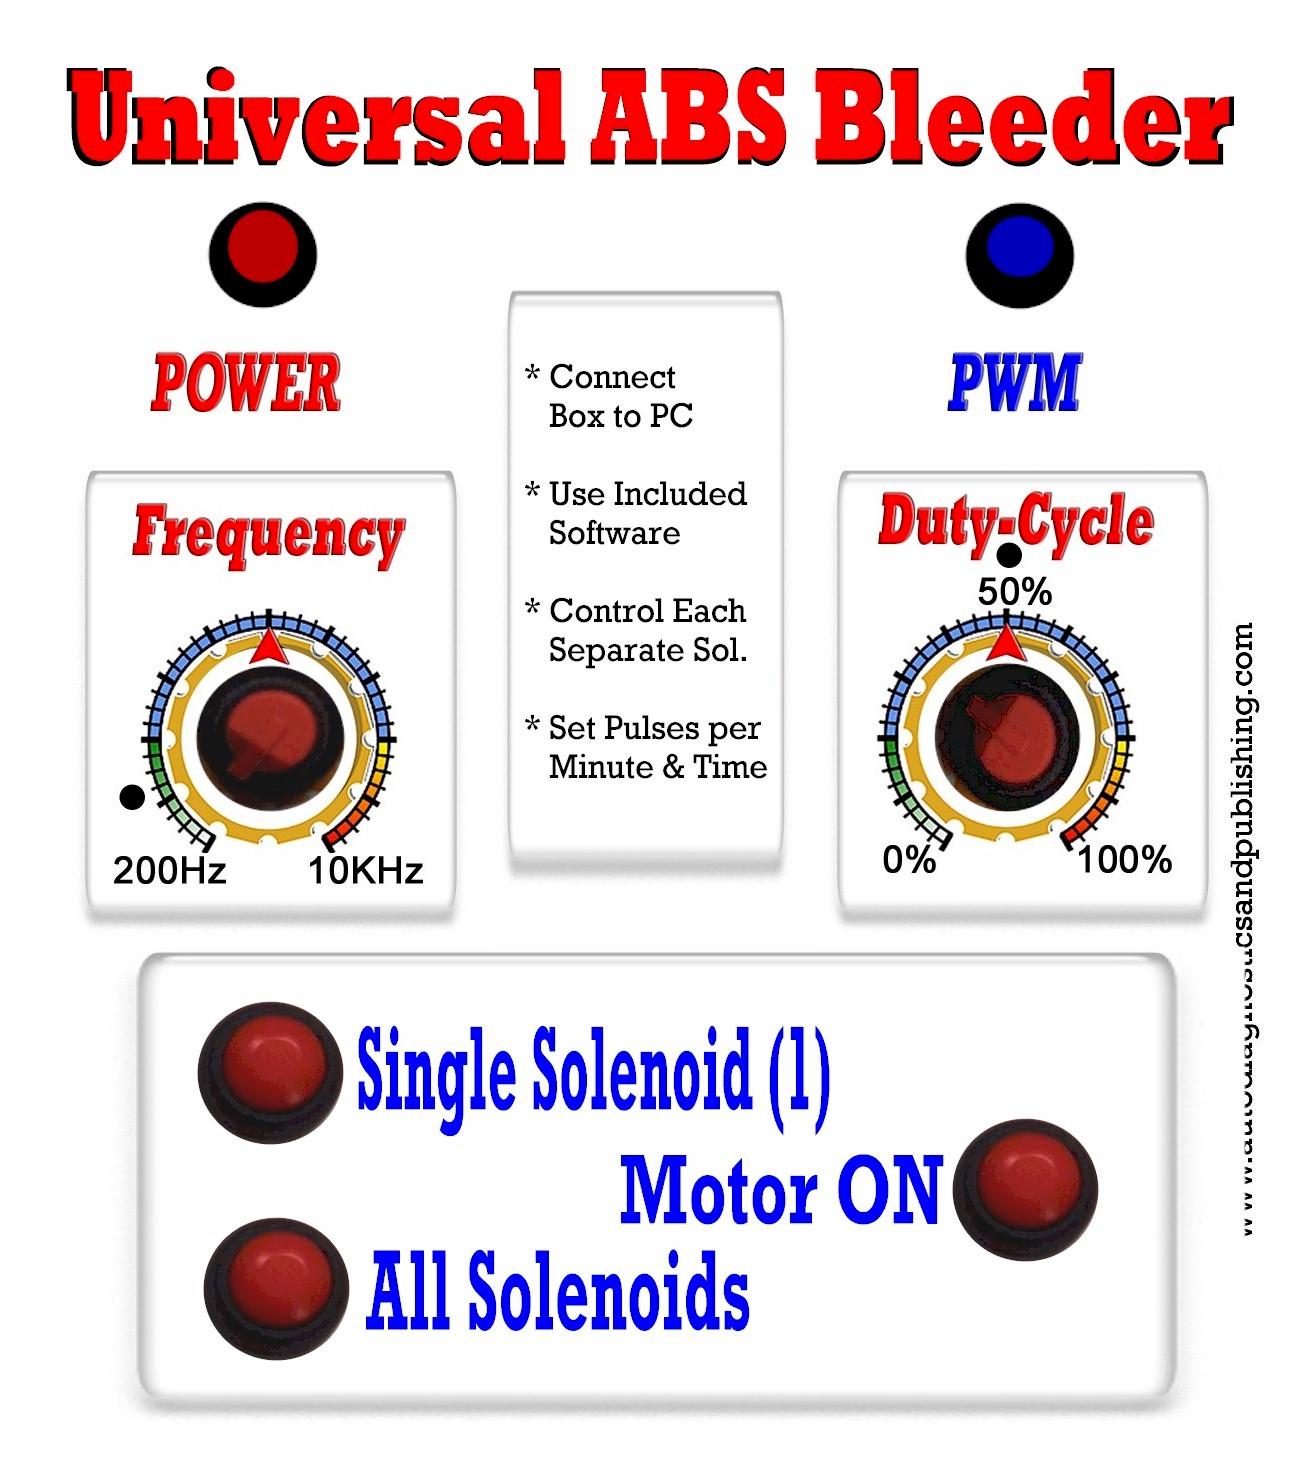 Universal ABS Bleeder 3